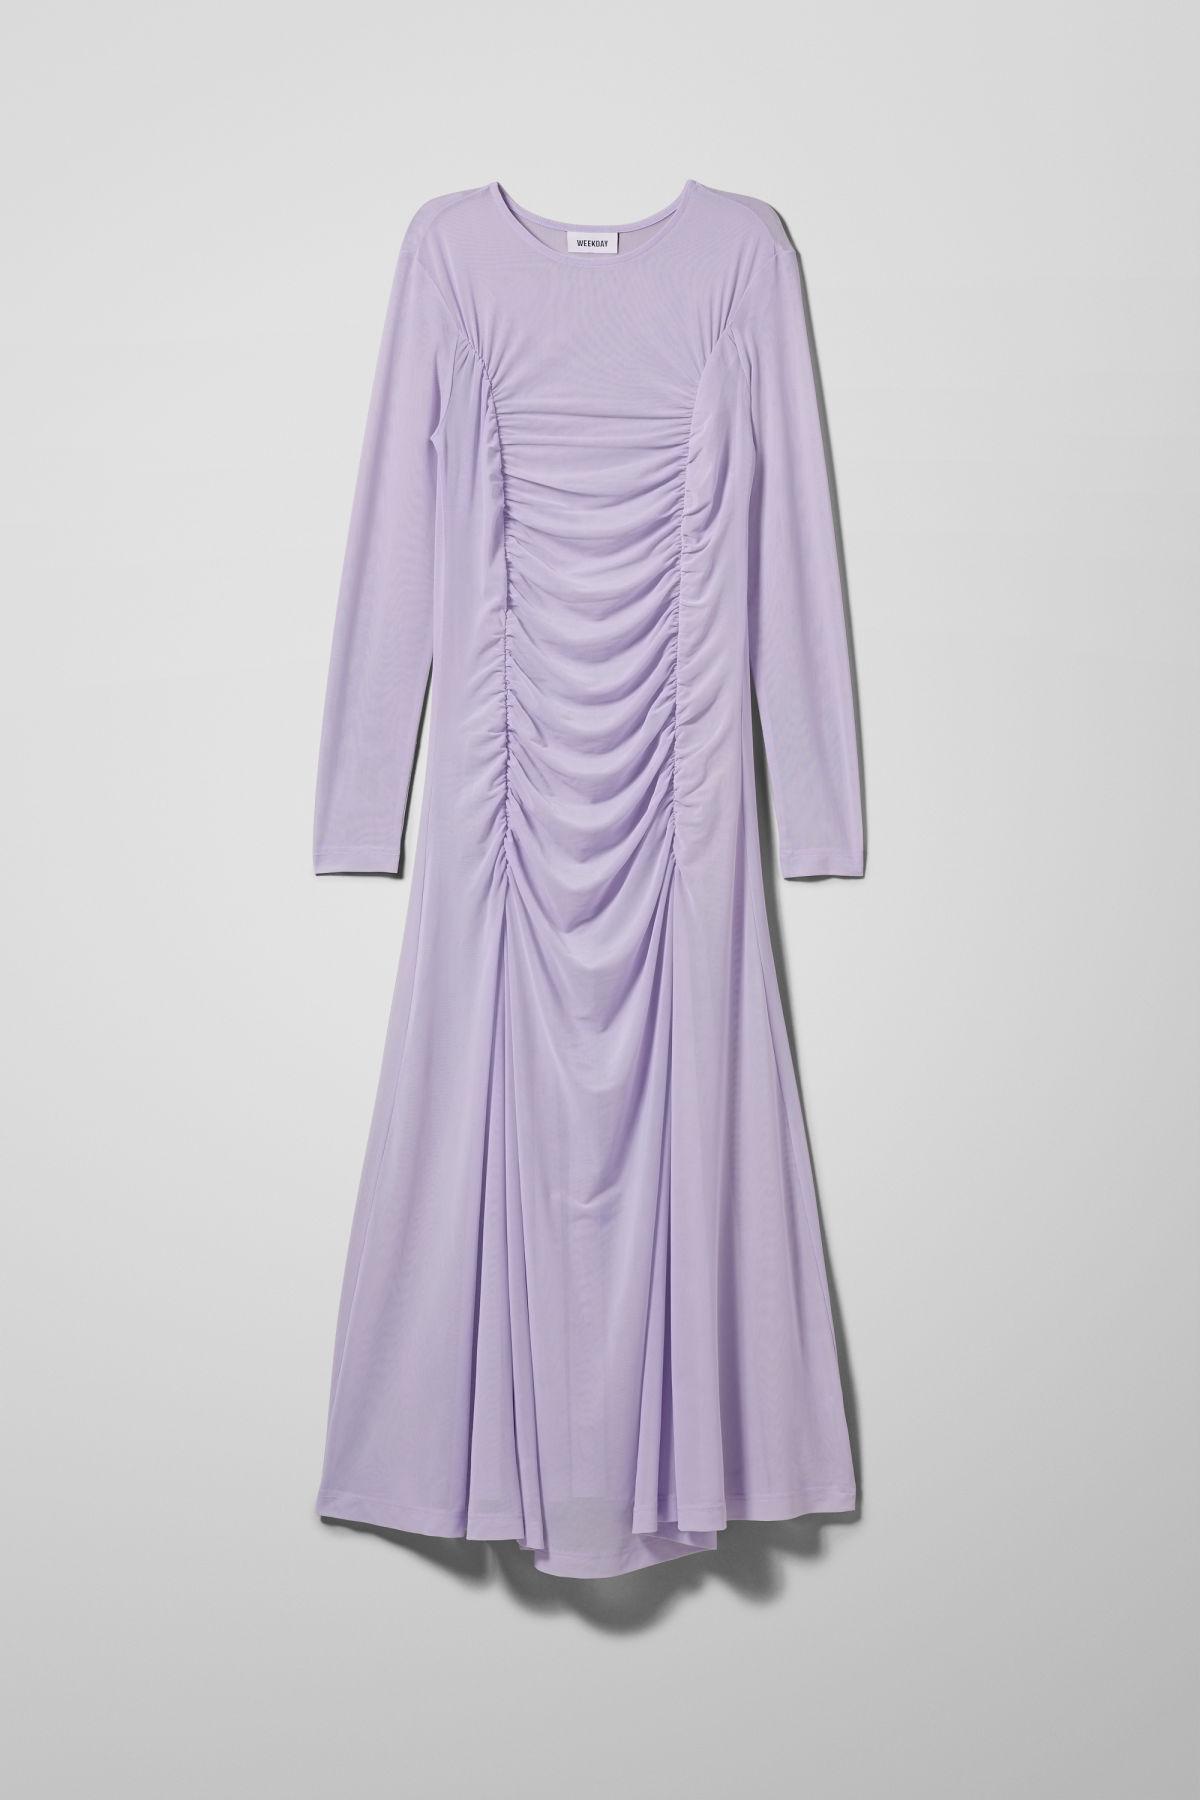 Image of Kaylee Mesh Dress - Purple-XS